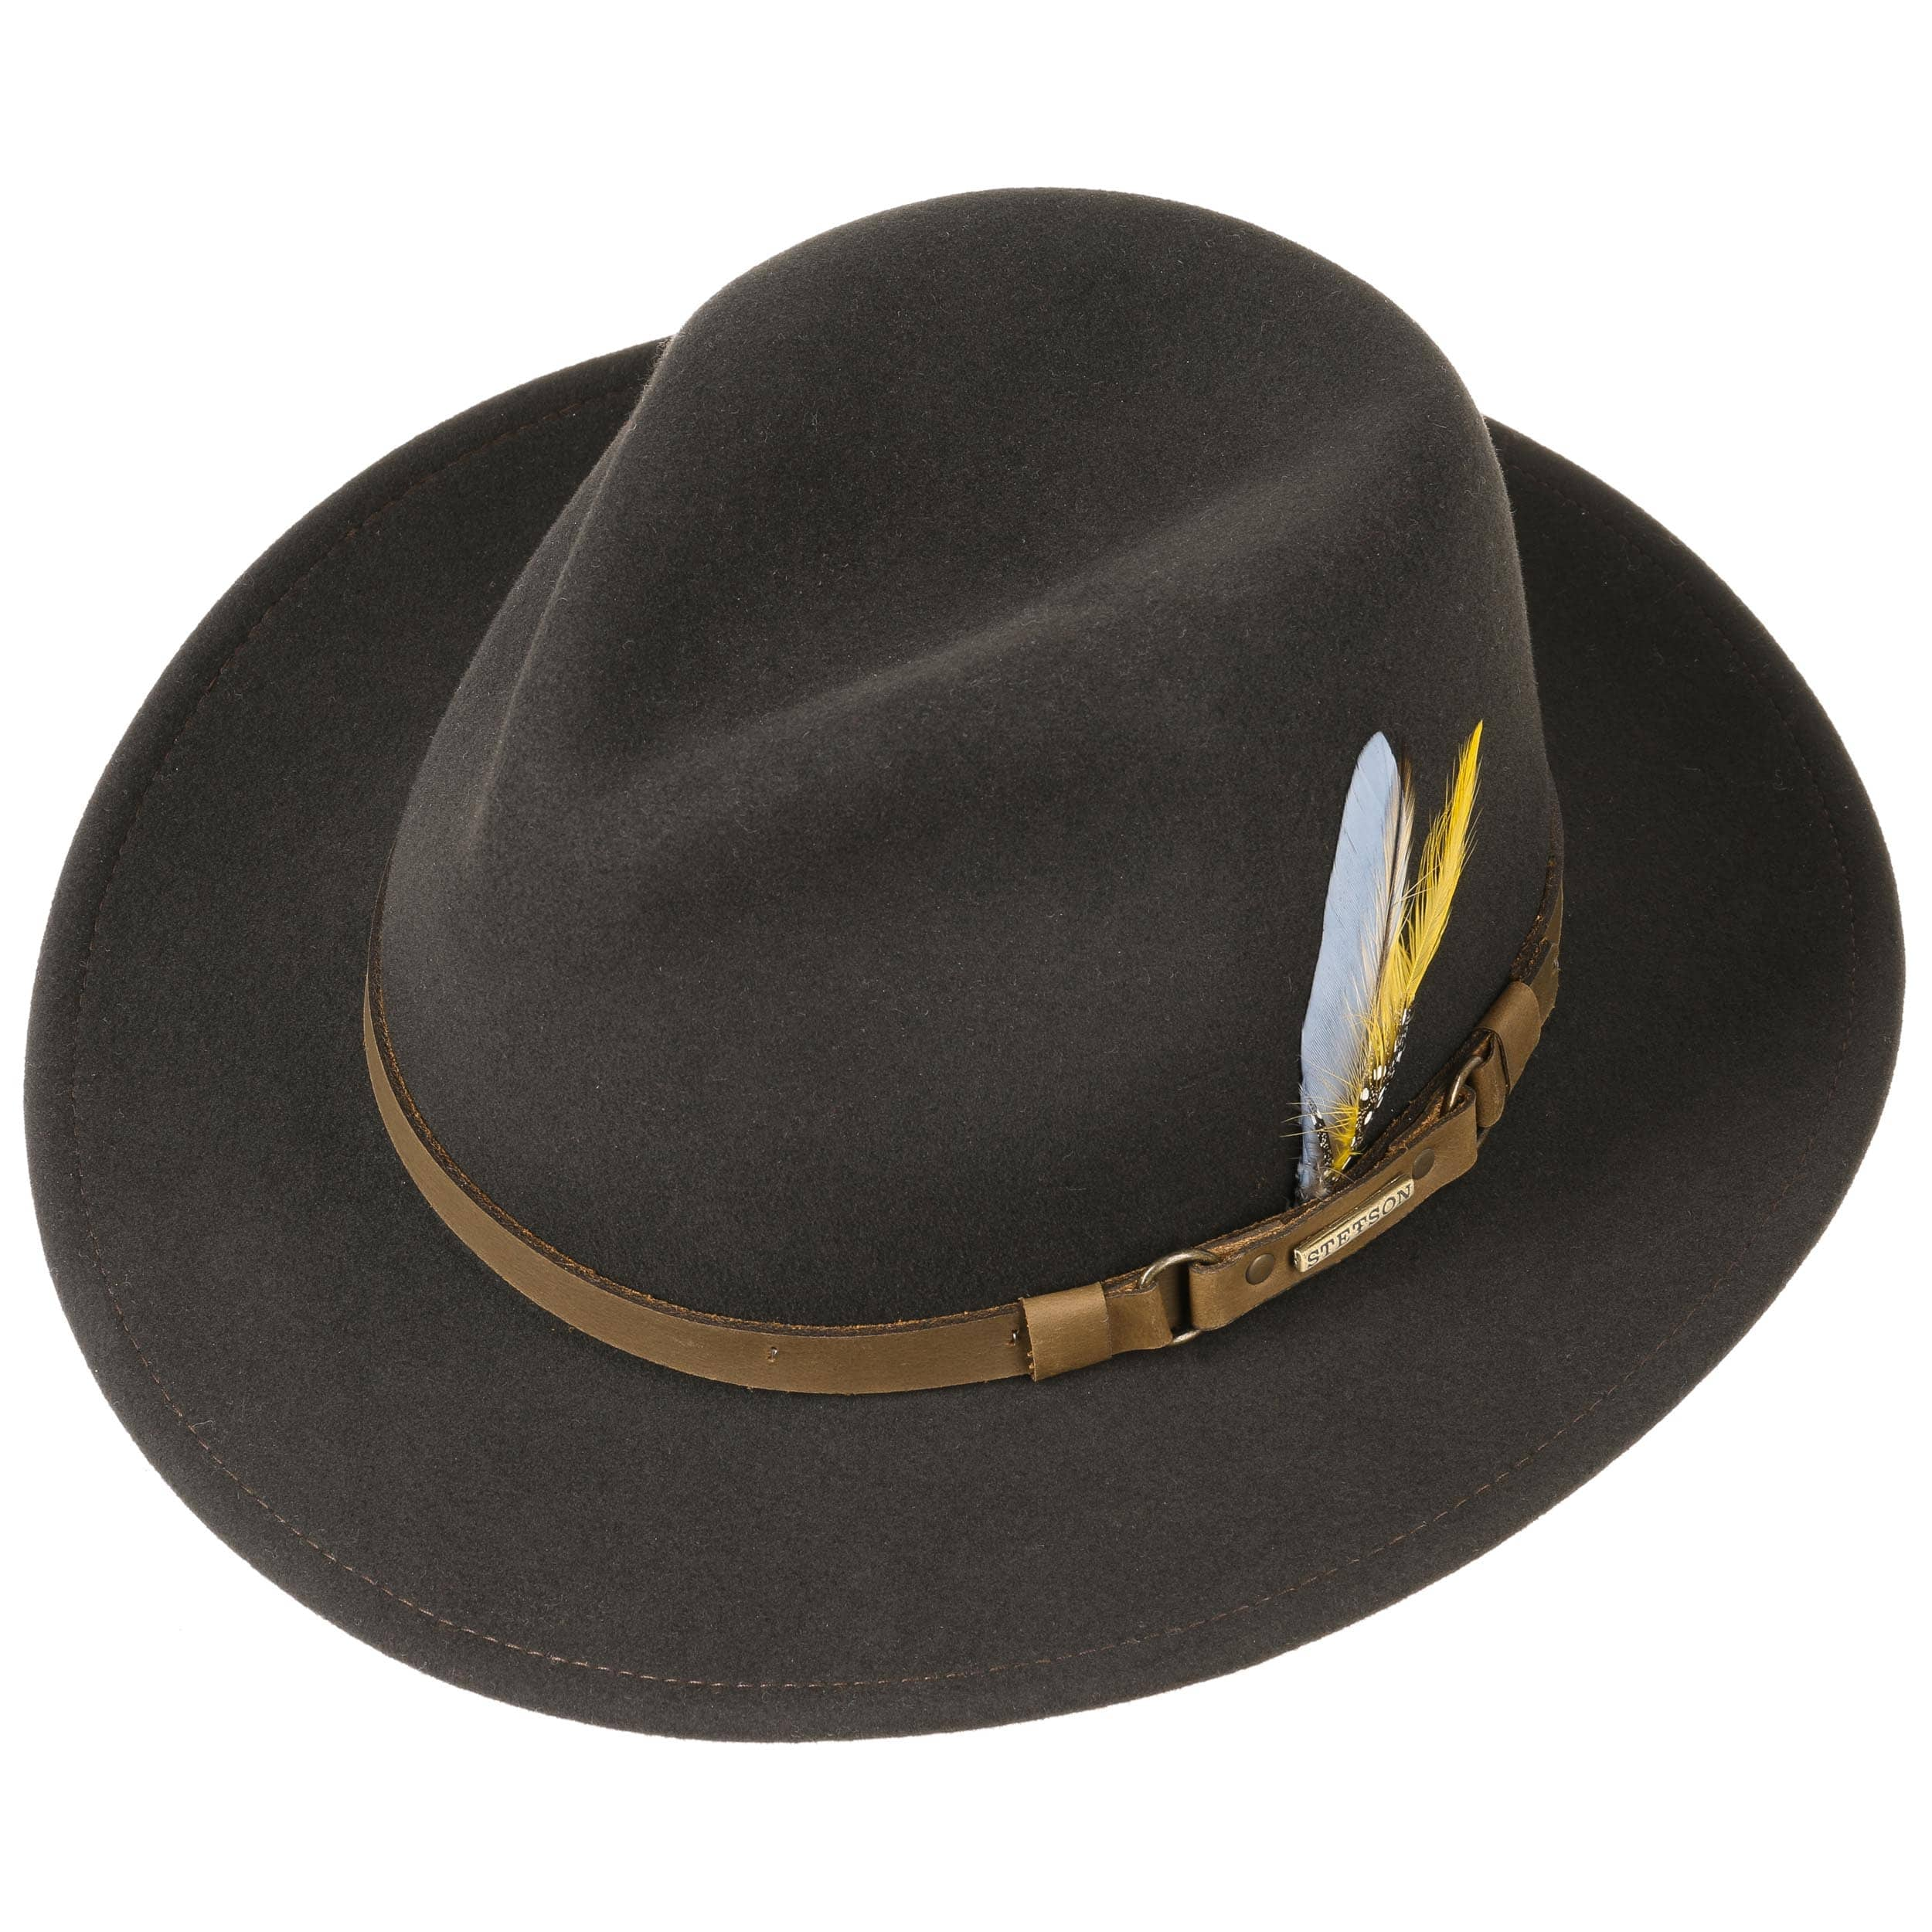 Sombrero VitaFelt Hamlin by Stetson - Sombreros - sombreroshop.es 03d044aa2ce